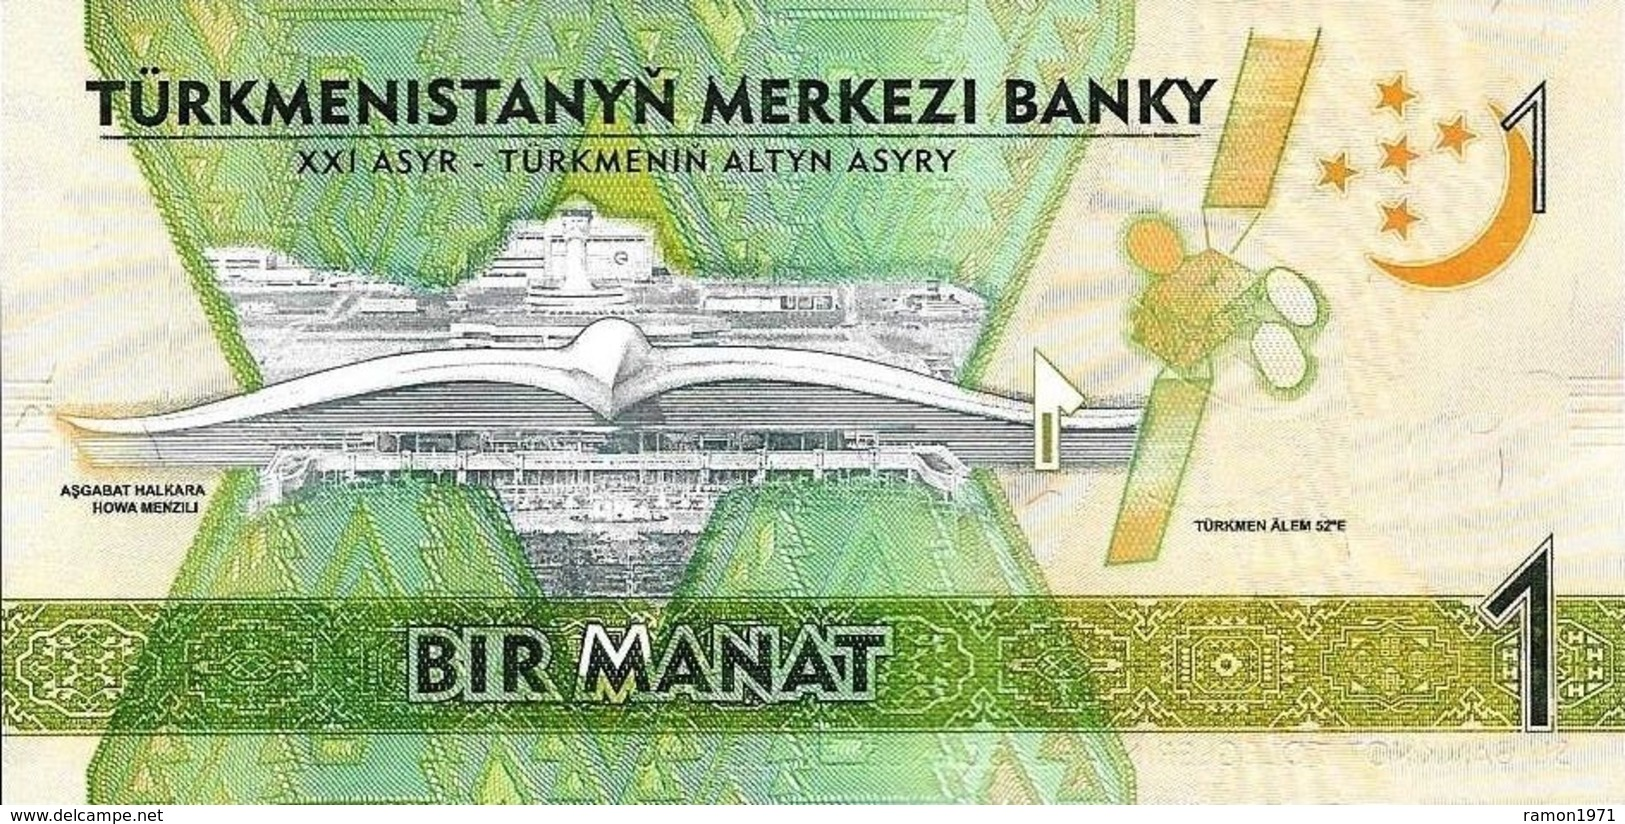 25 Pieces Turkmenistan - 1 Manat 2017 AA UNC Series - Turkmenistan